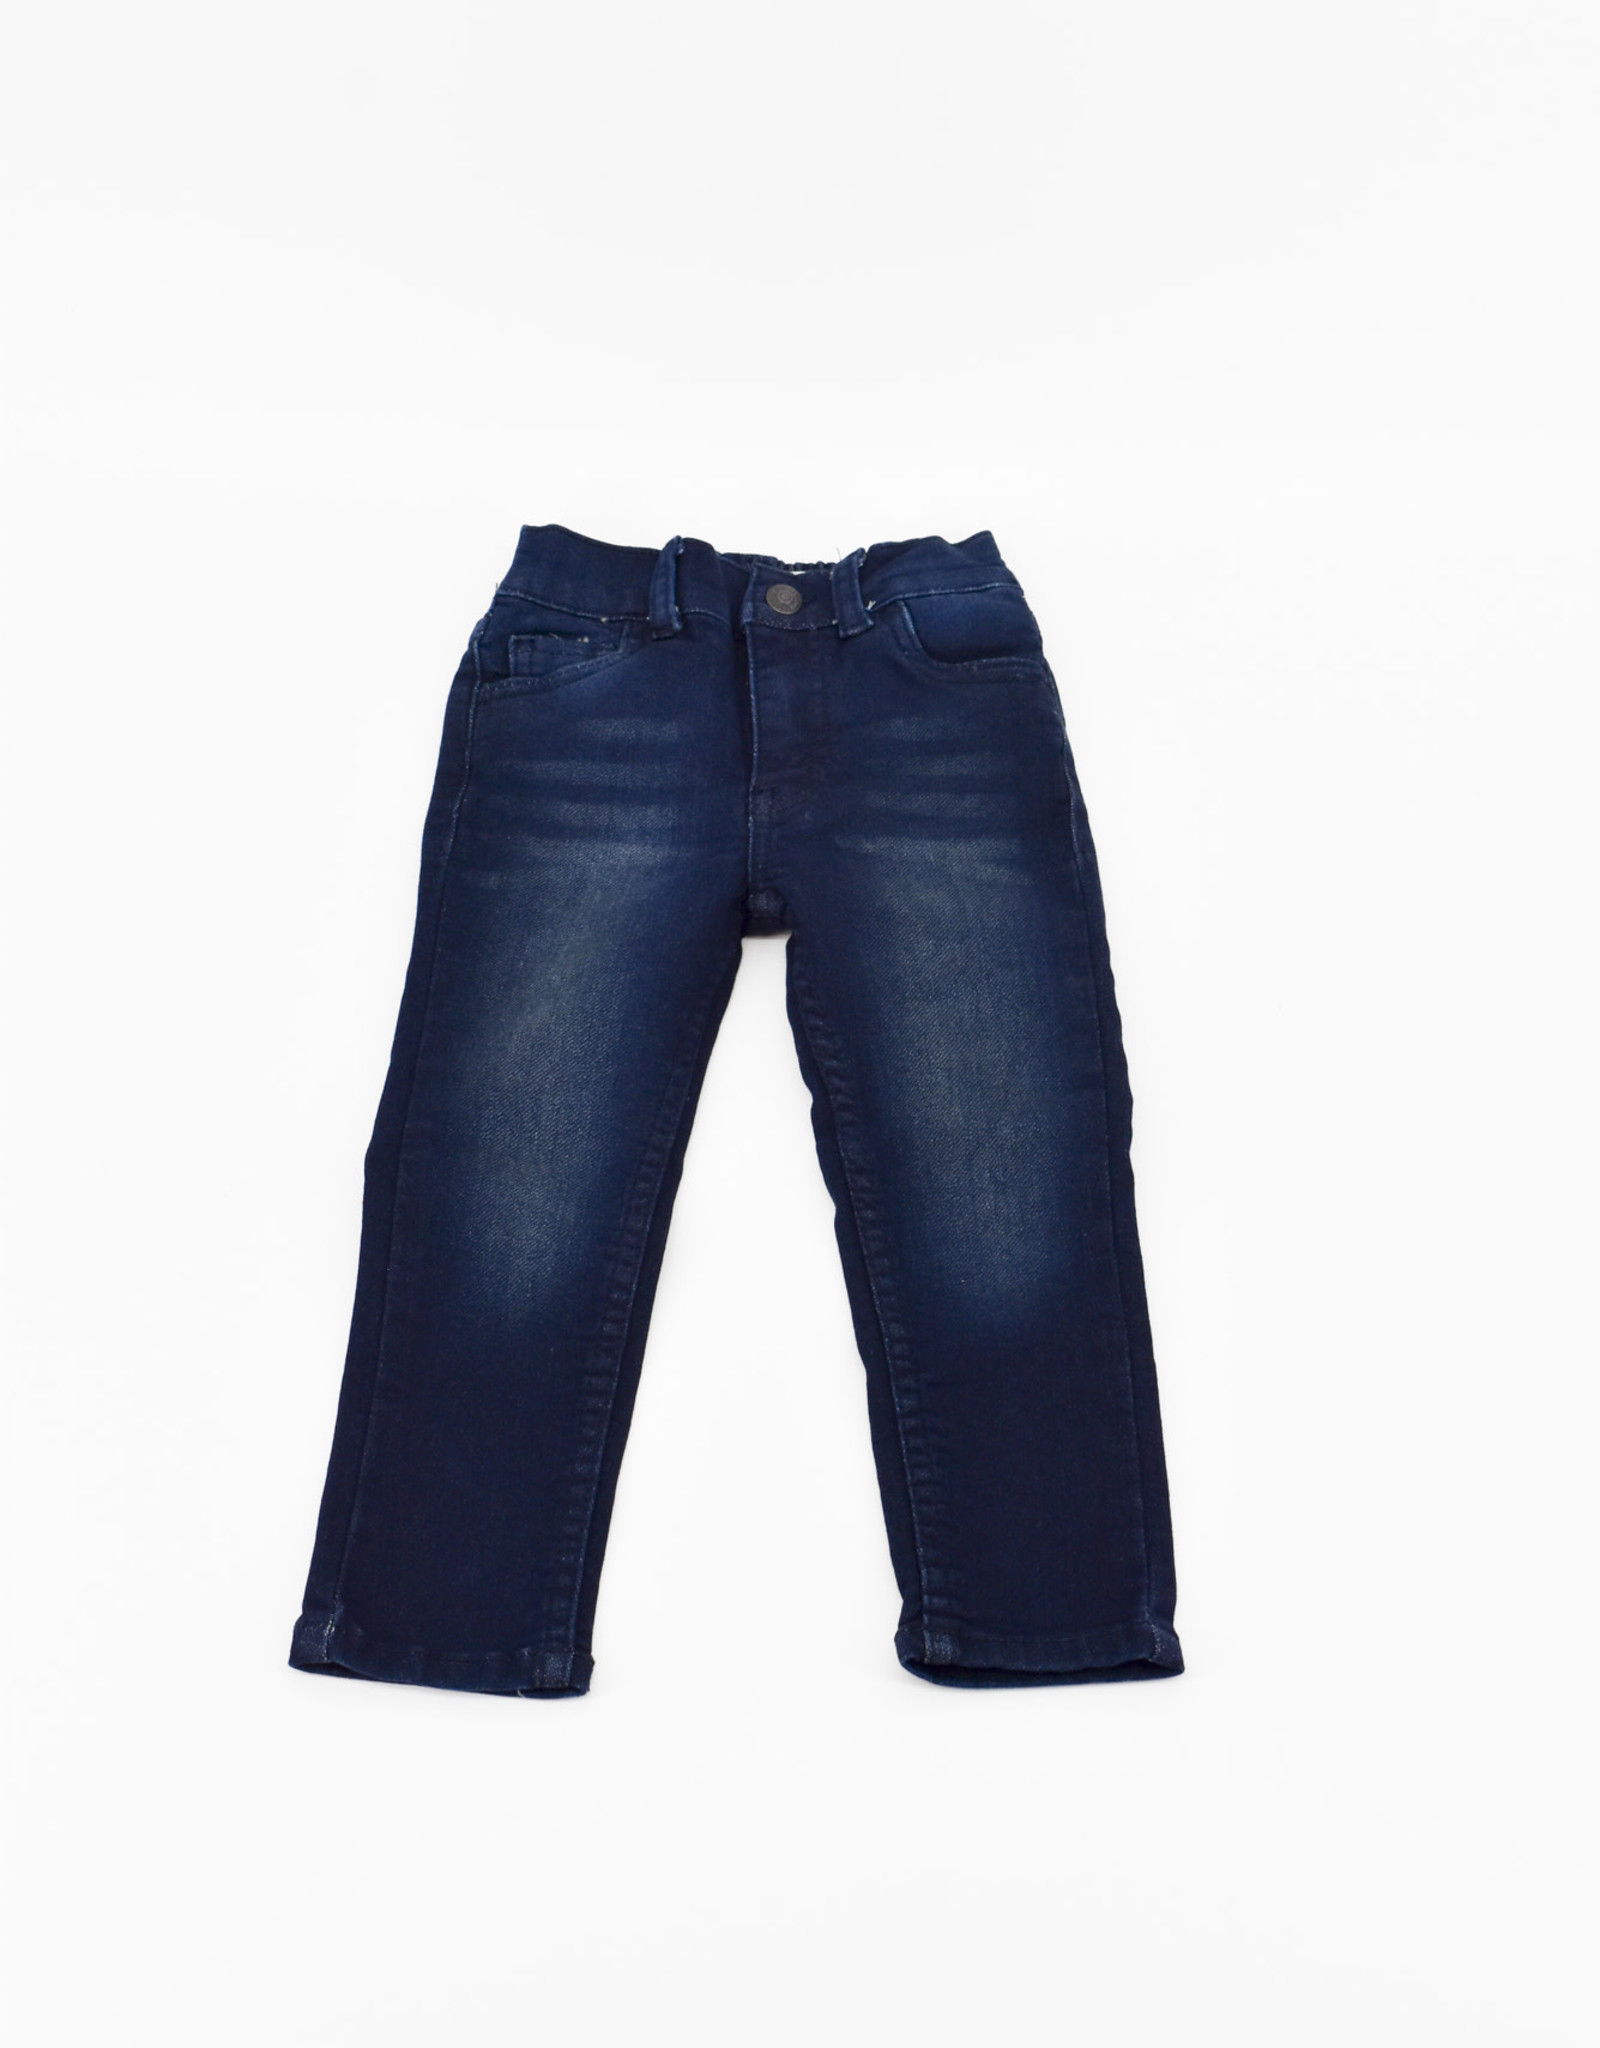 LEVI'S Lvb Skinny Knit Pull On Jean Rocket Man